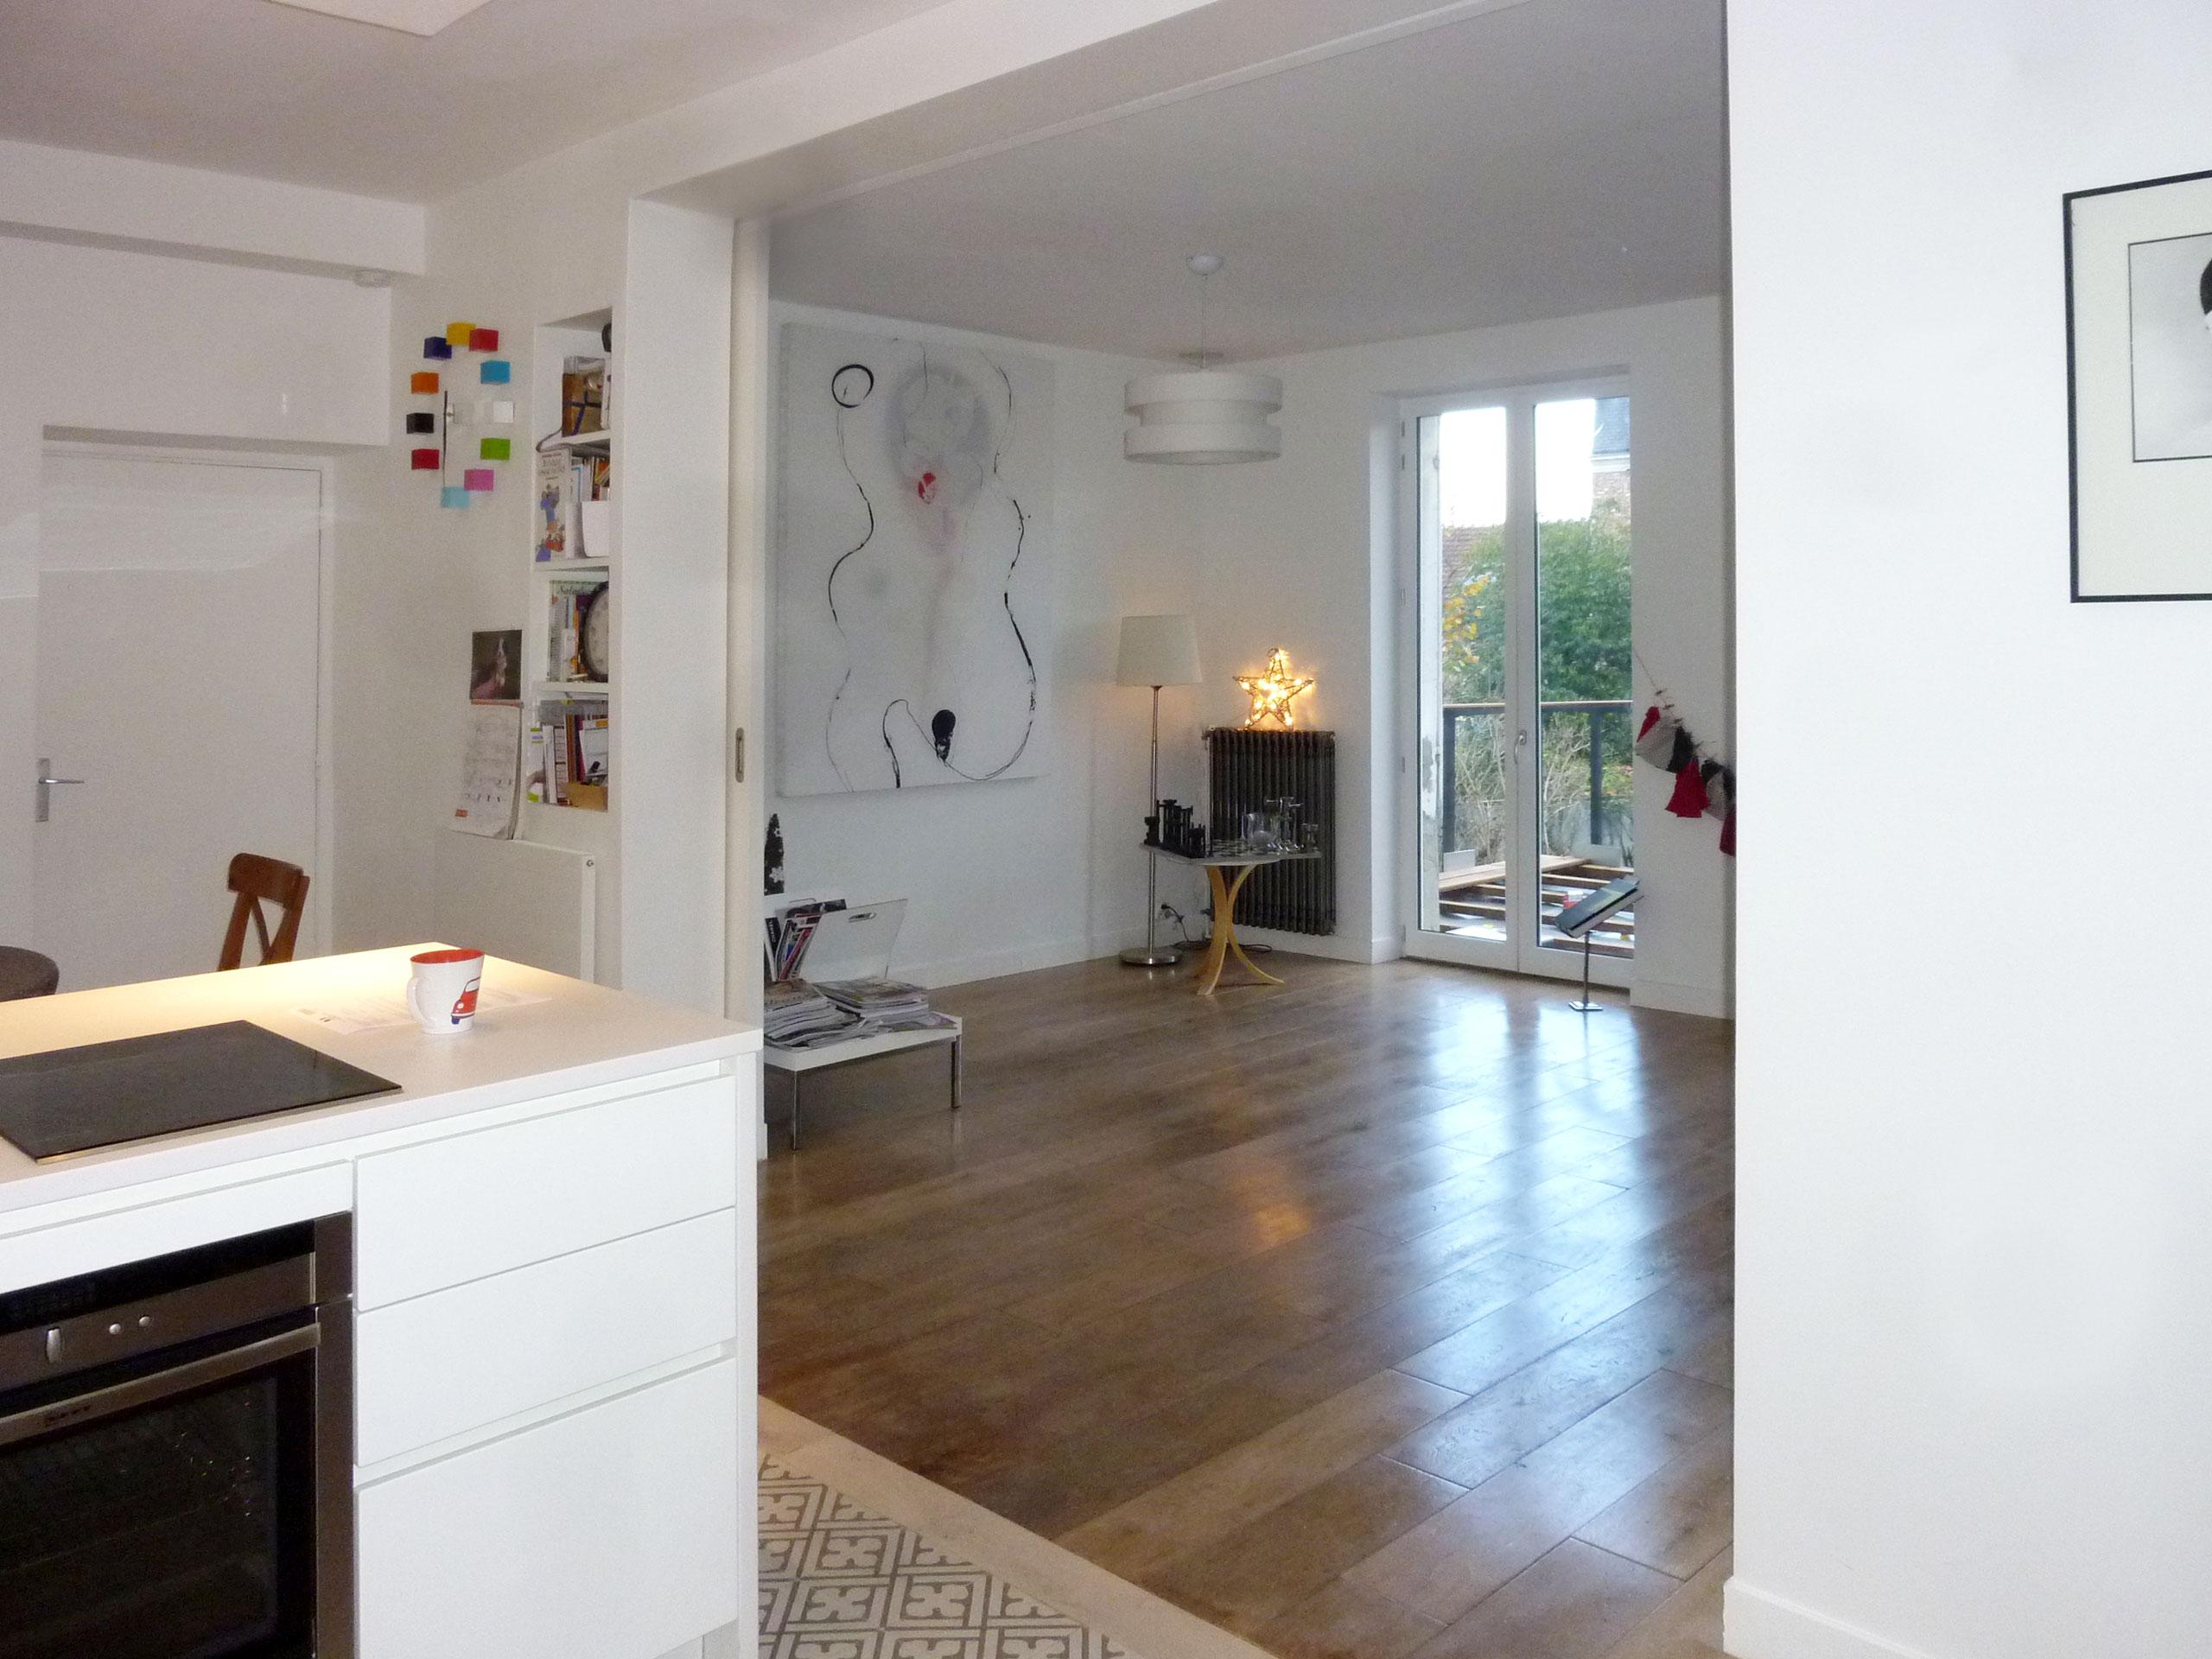 olivier-stadler-architecte-meudon-rehabilitation-extensions-maison (19)